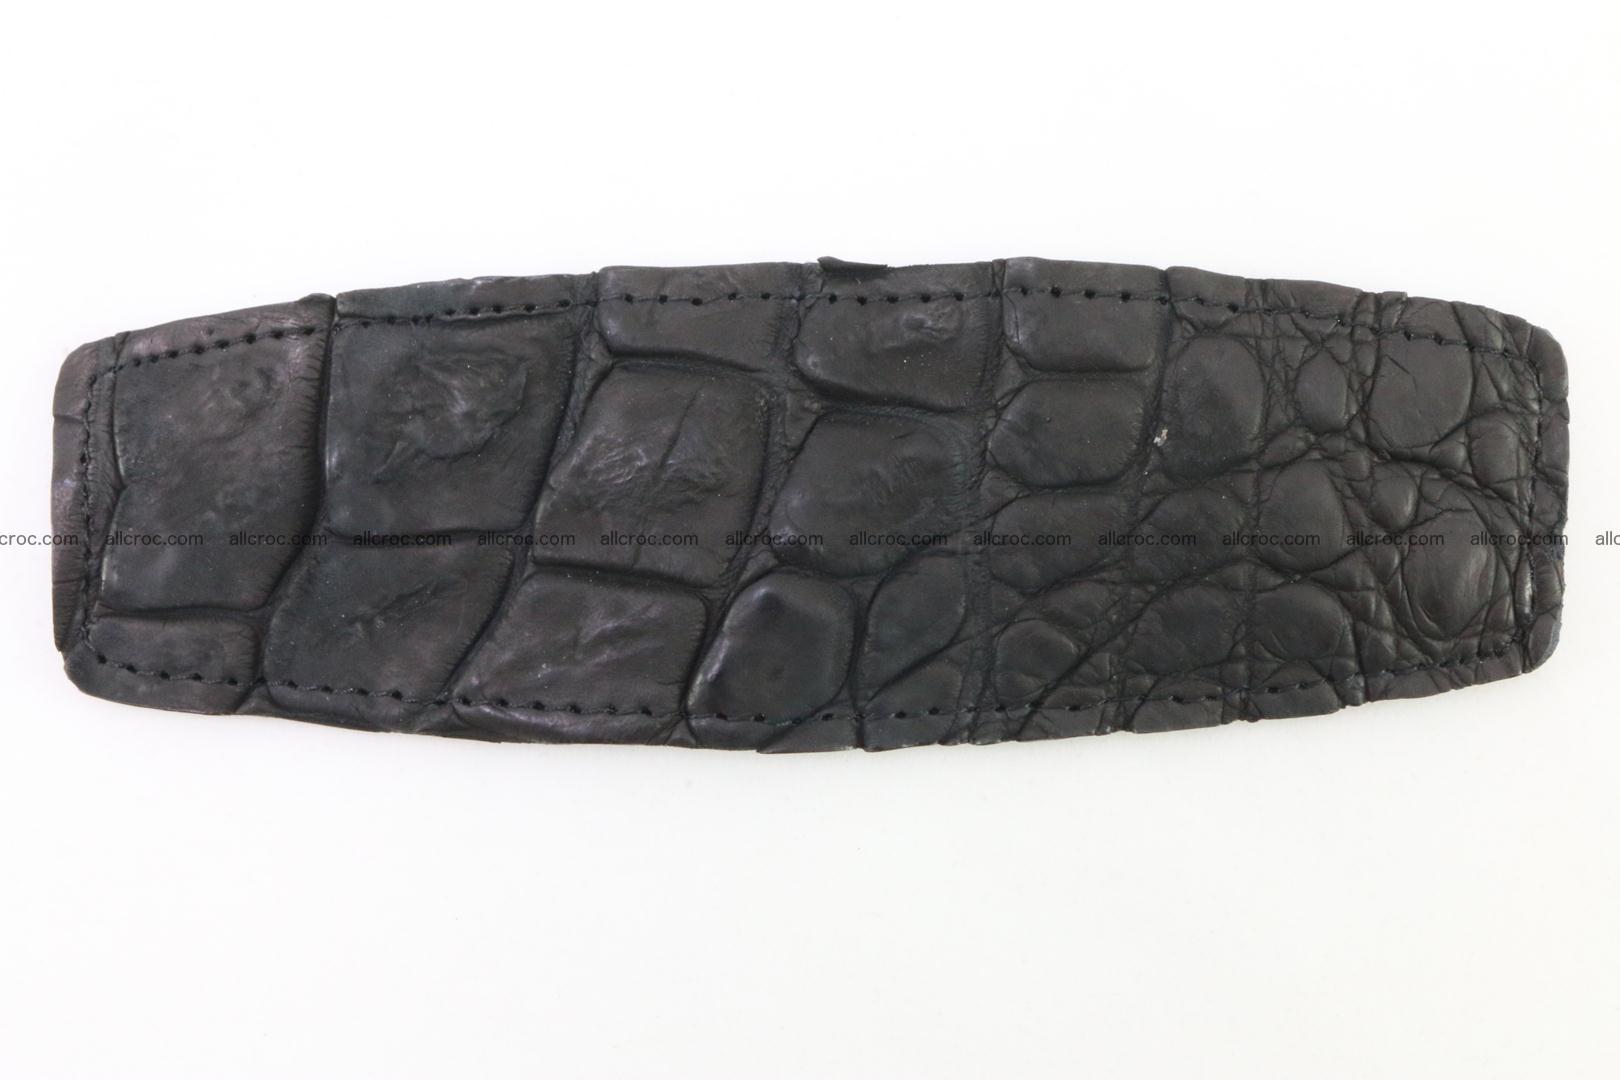 Crocodile leather half-belt for simple pin buckle 002 Foto 1